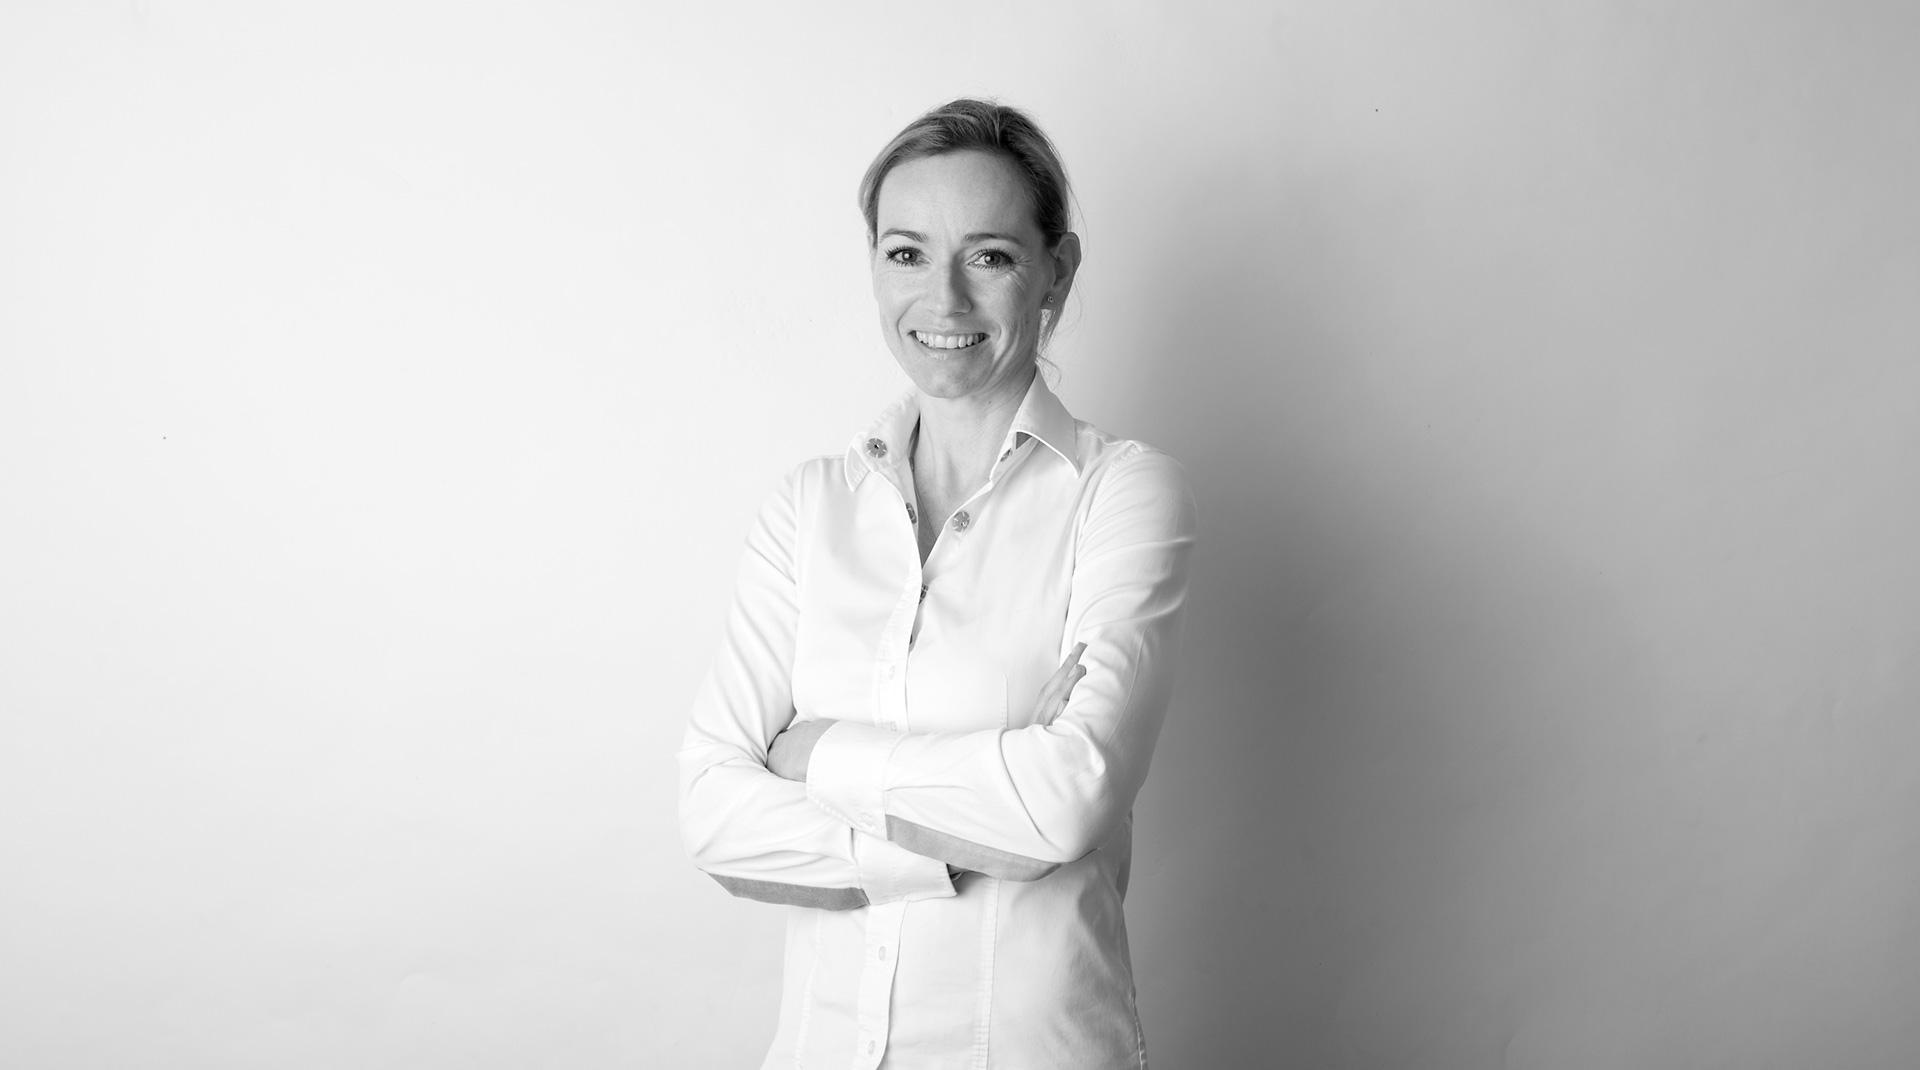 Dr. Lucie Strehn